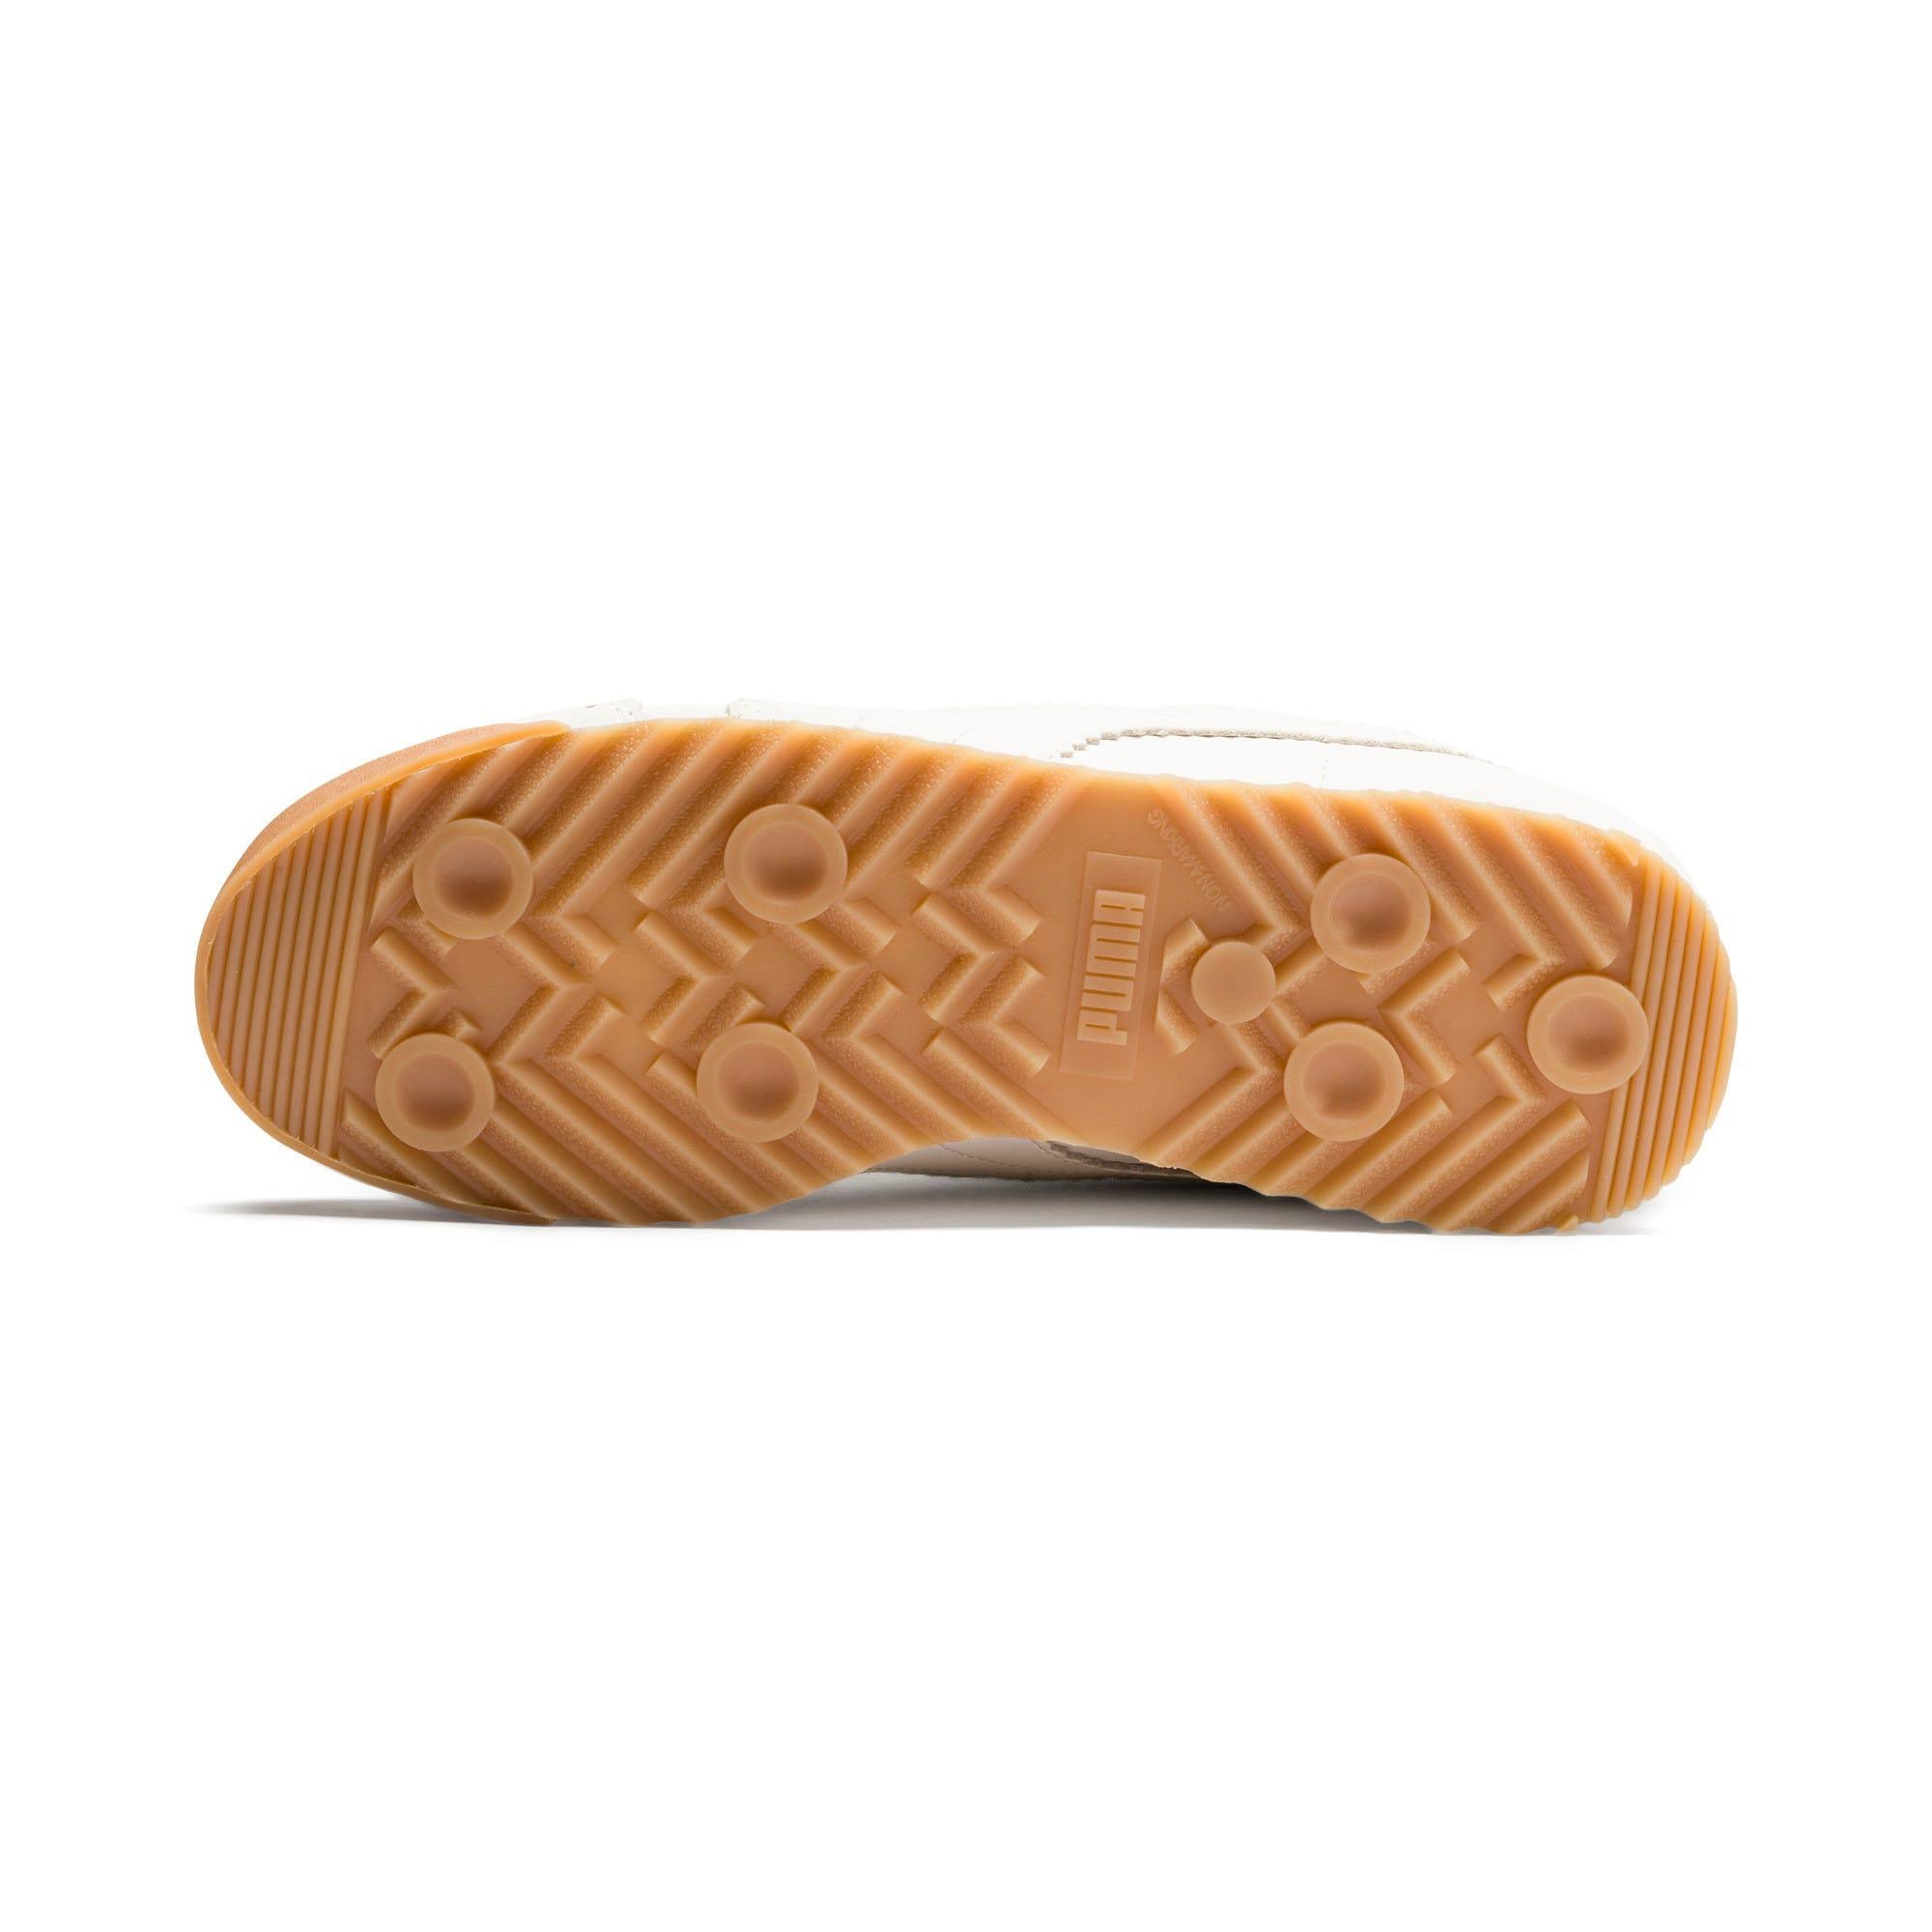 Miniatura 4 de Zapatos deportivos Roma Brogue para mujer, Pastel Parchment-P.Team Gold, mediano